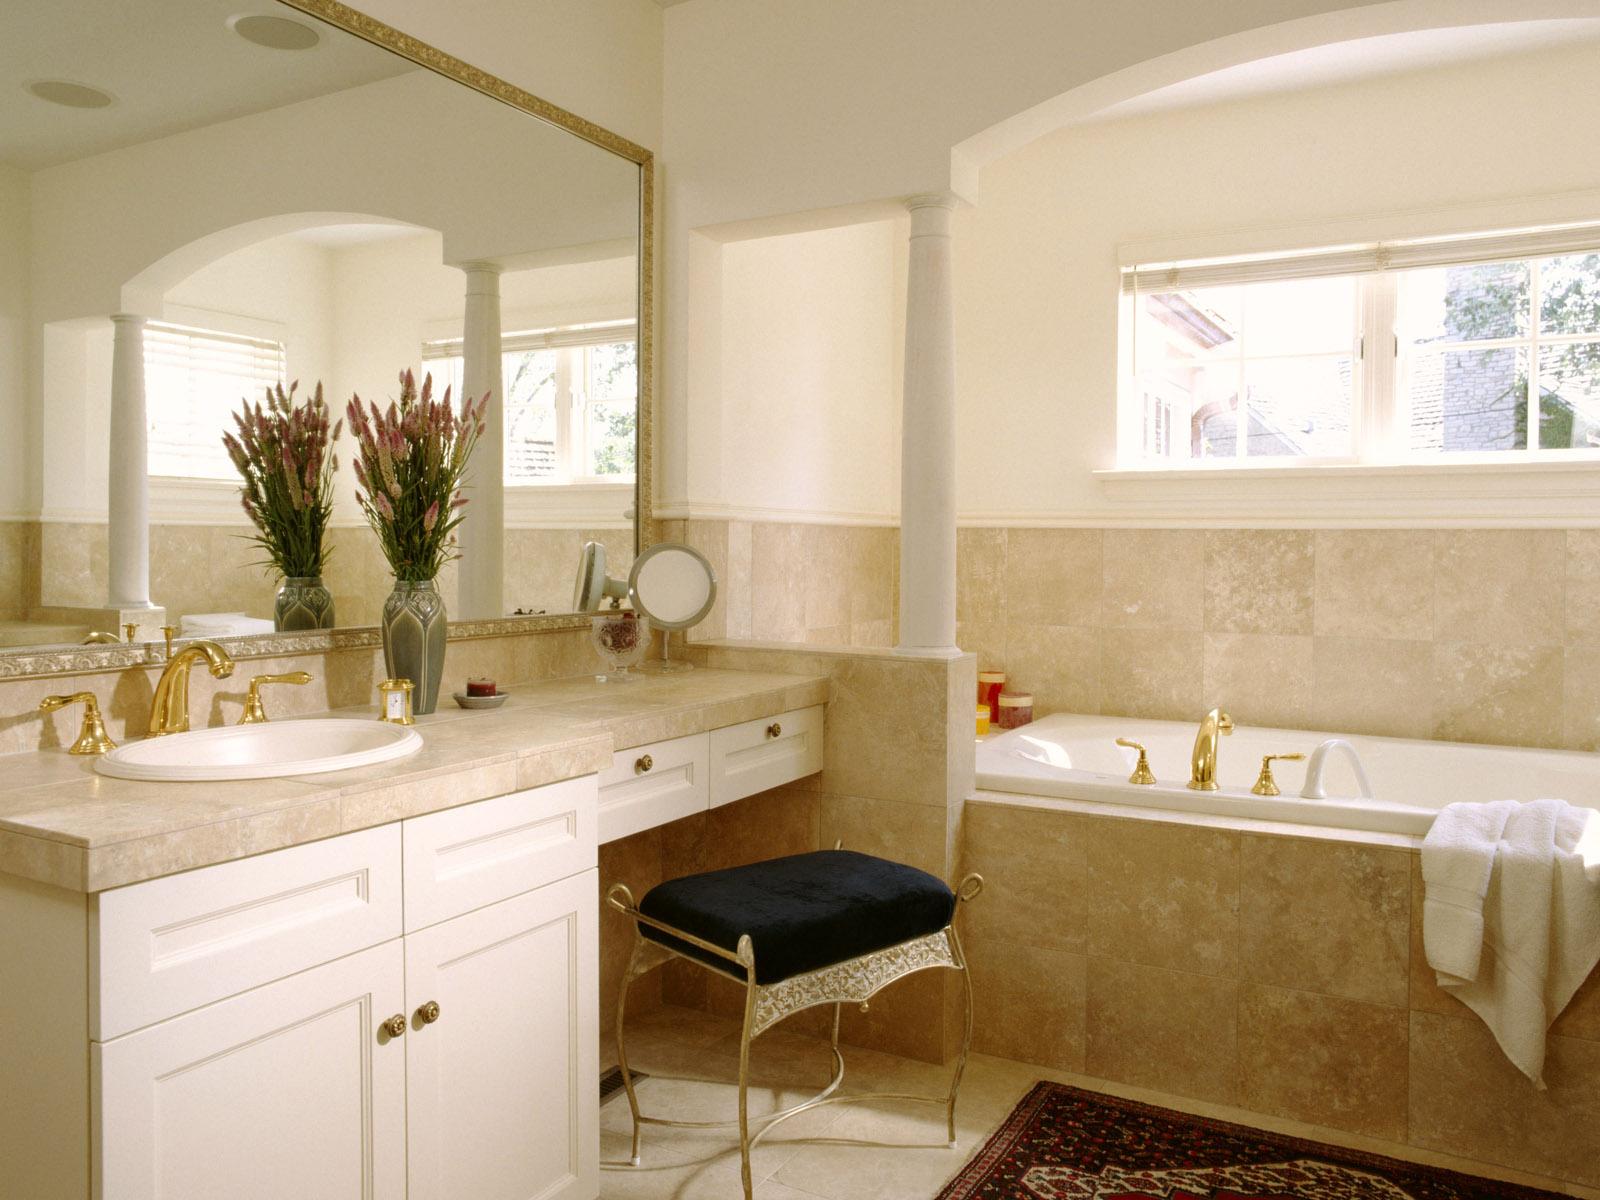 Toilets Designs interior design tips: bath rooms and toilets designs